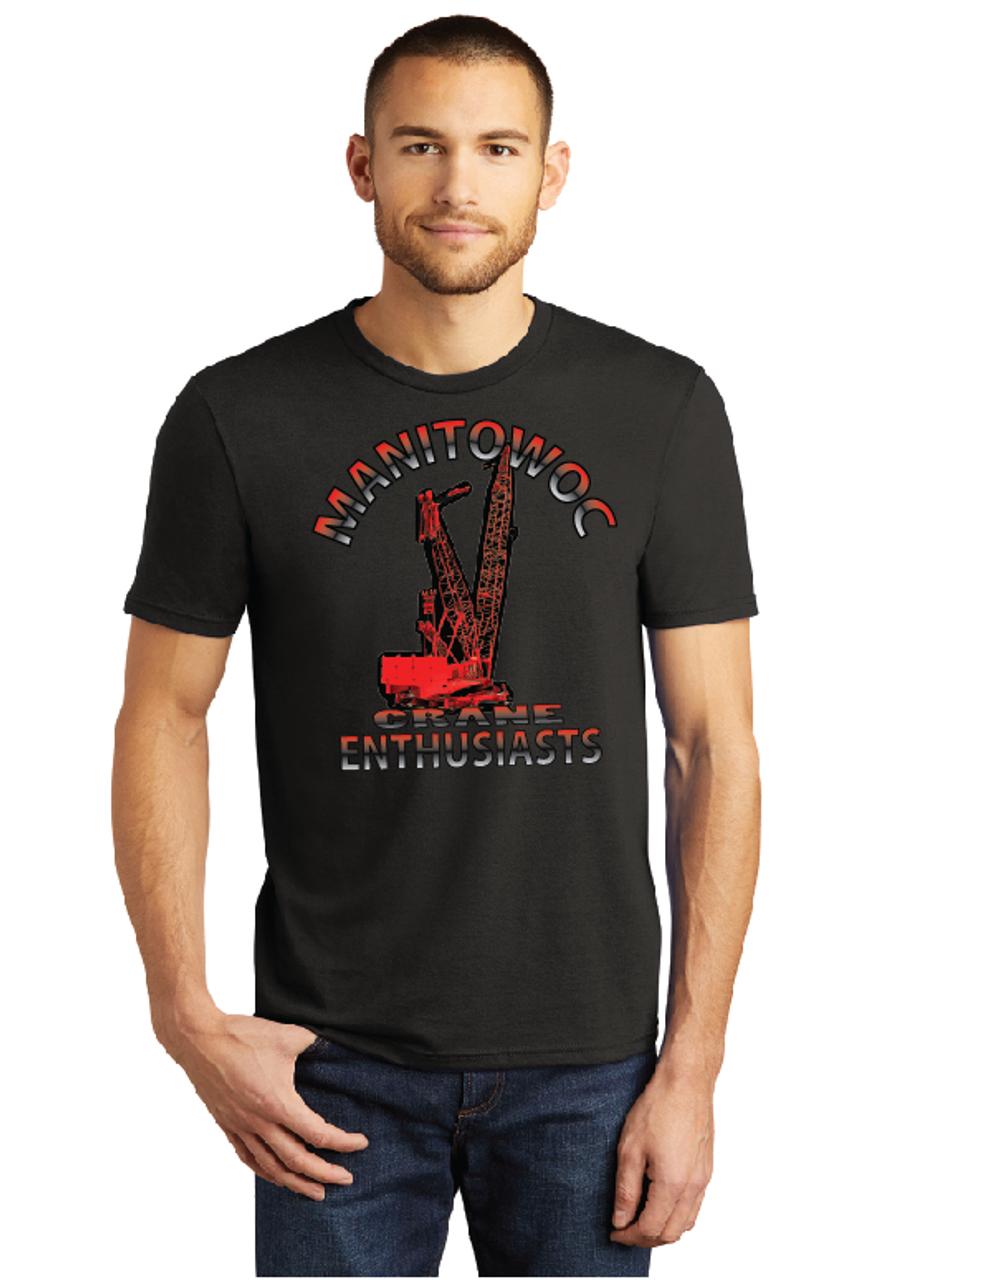 Graphic Sample of shirt